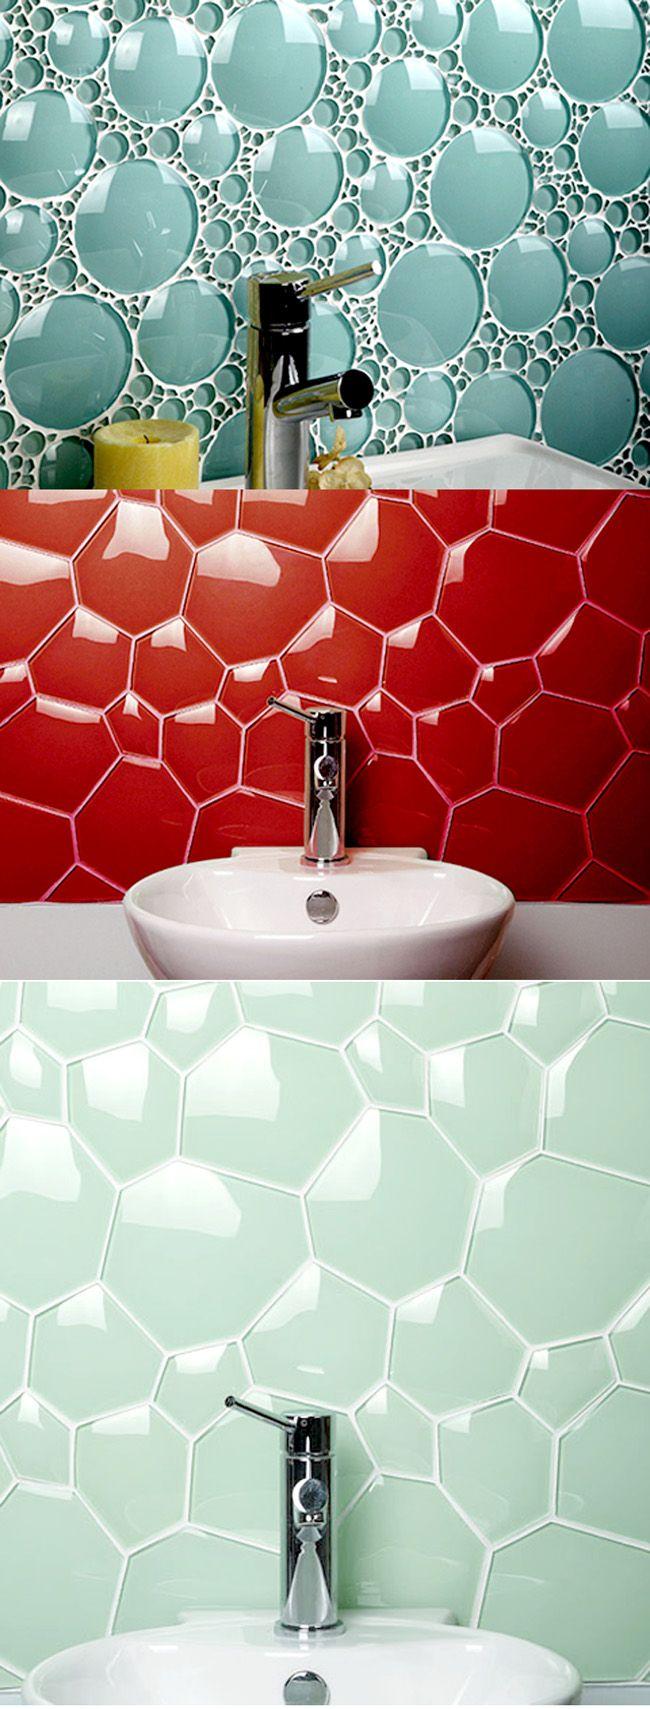 #Design - Glass tiles. #onlineartgallery - #contemporaryart - online art gallery - contemporary art Source : http://www.ideastosteal.com/2011/01/kreative-lekre-fliser/